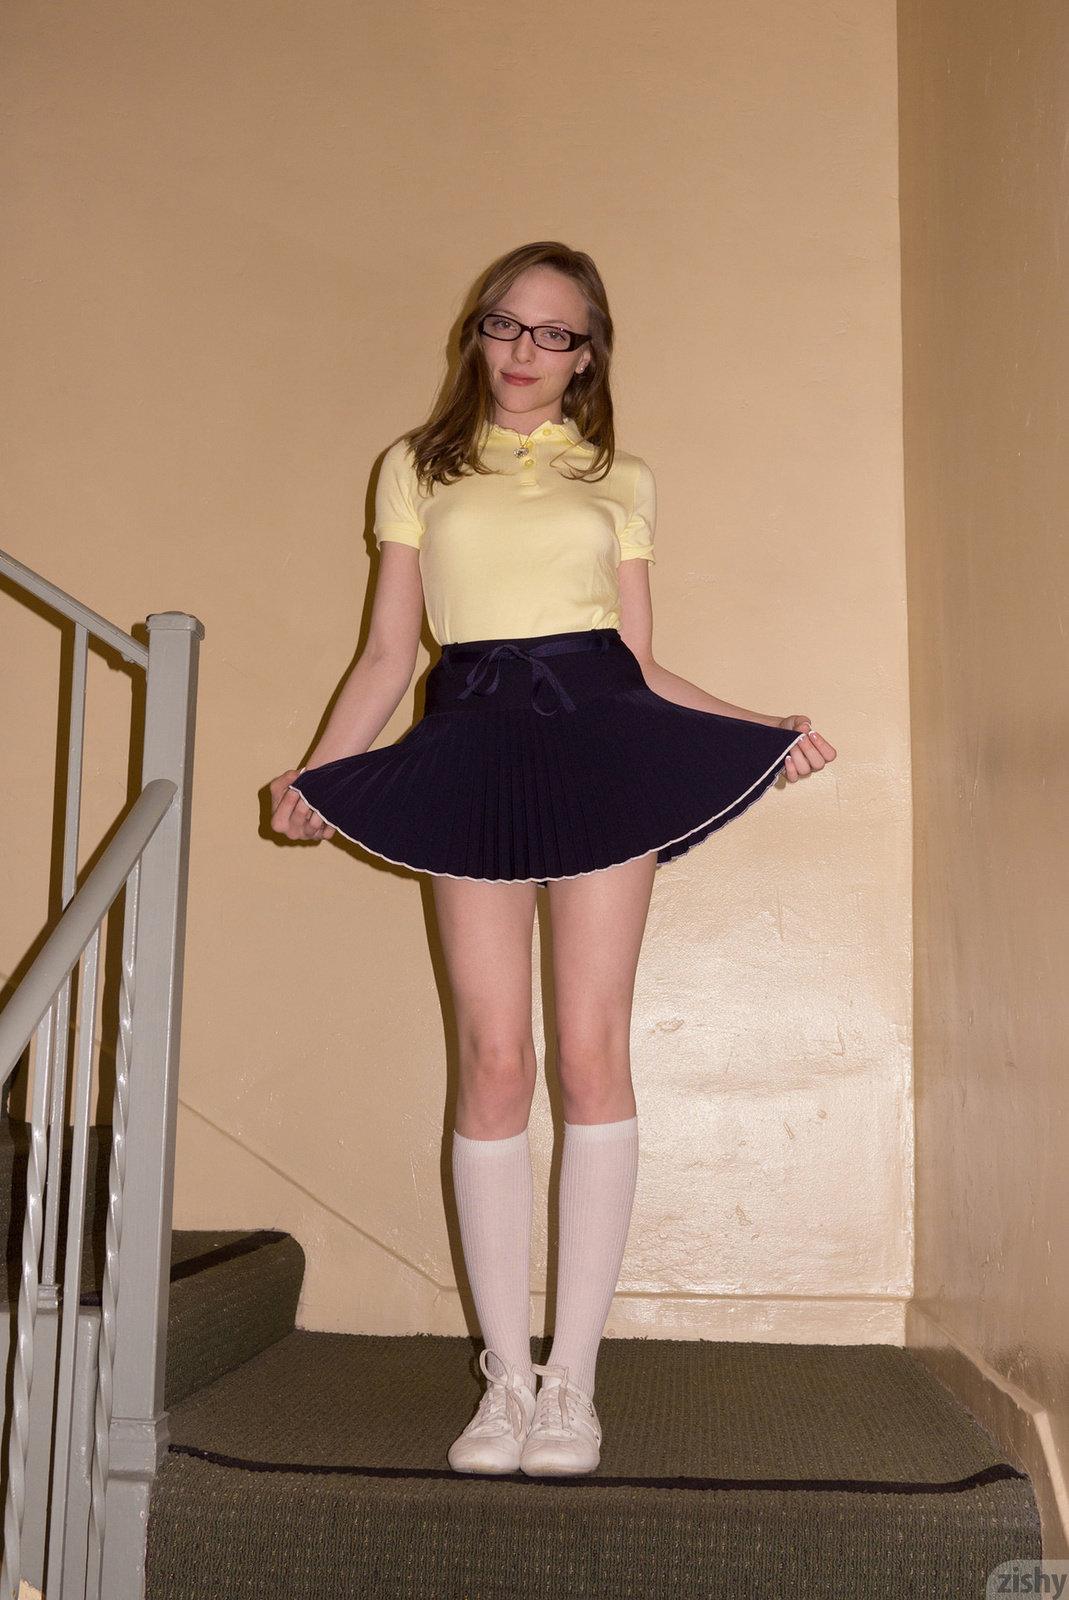 Aubrey Star in Privates School by Zishy 12 photos